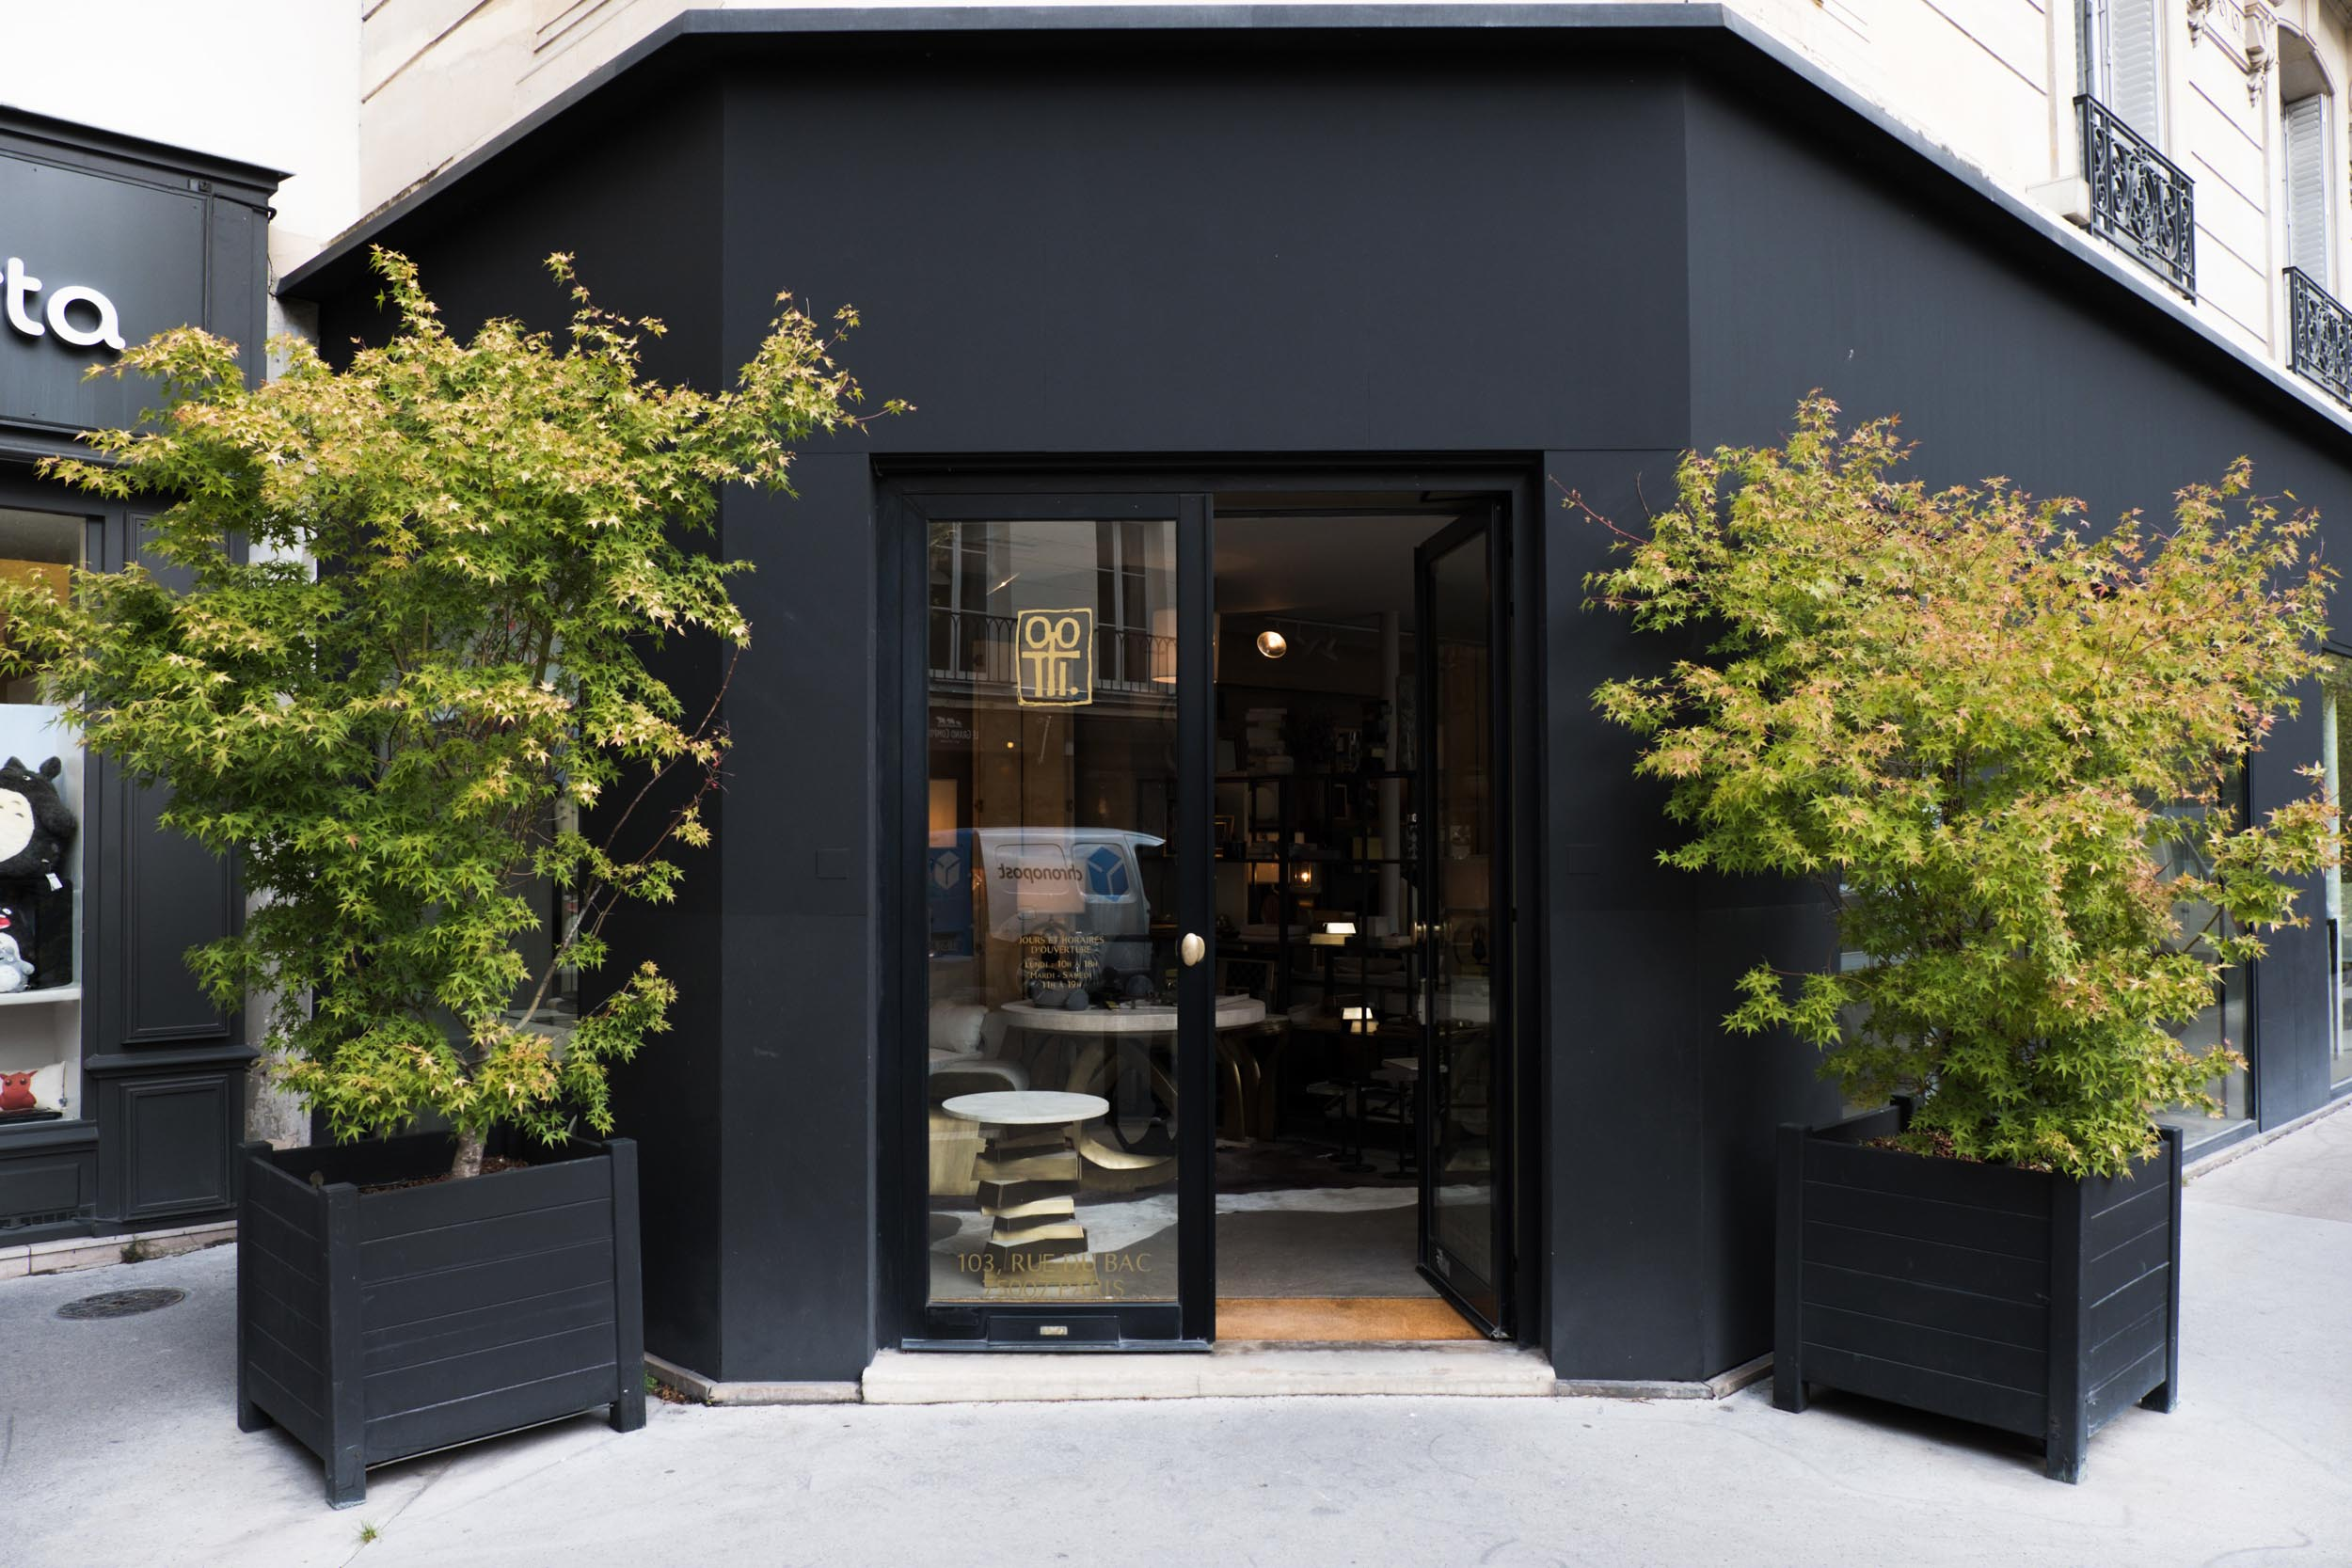 store-103-rue-du-bac-paris-kifu-paris-ry-augousti